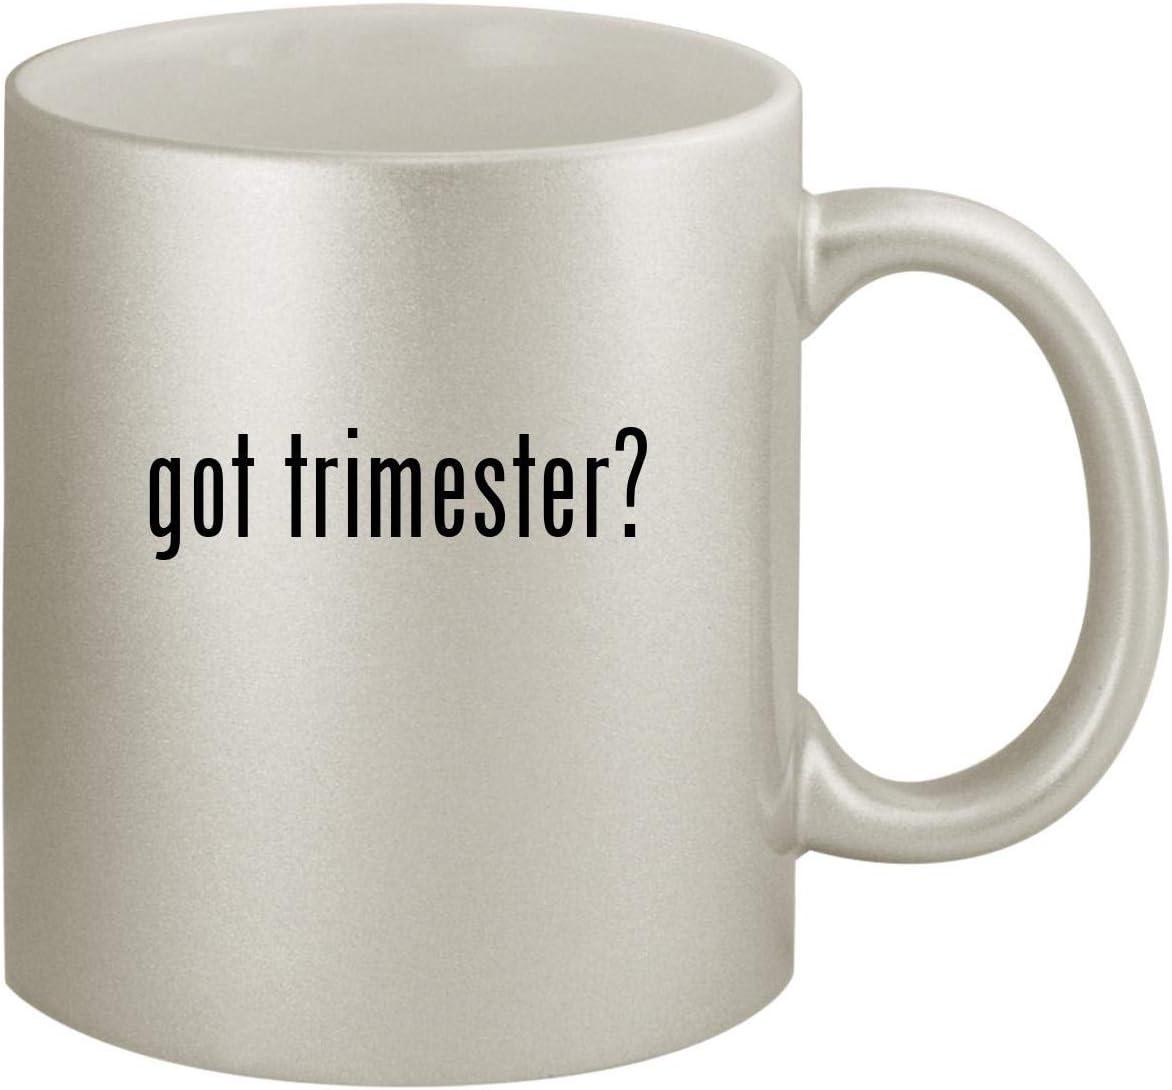 got trimester? - Ceramic 11oz Silver Coffee Mug, Silver